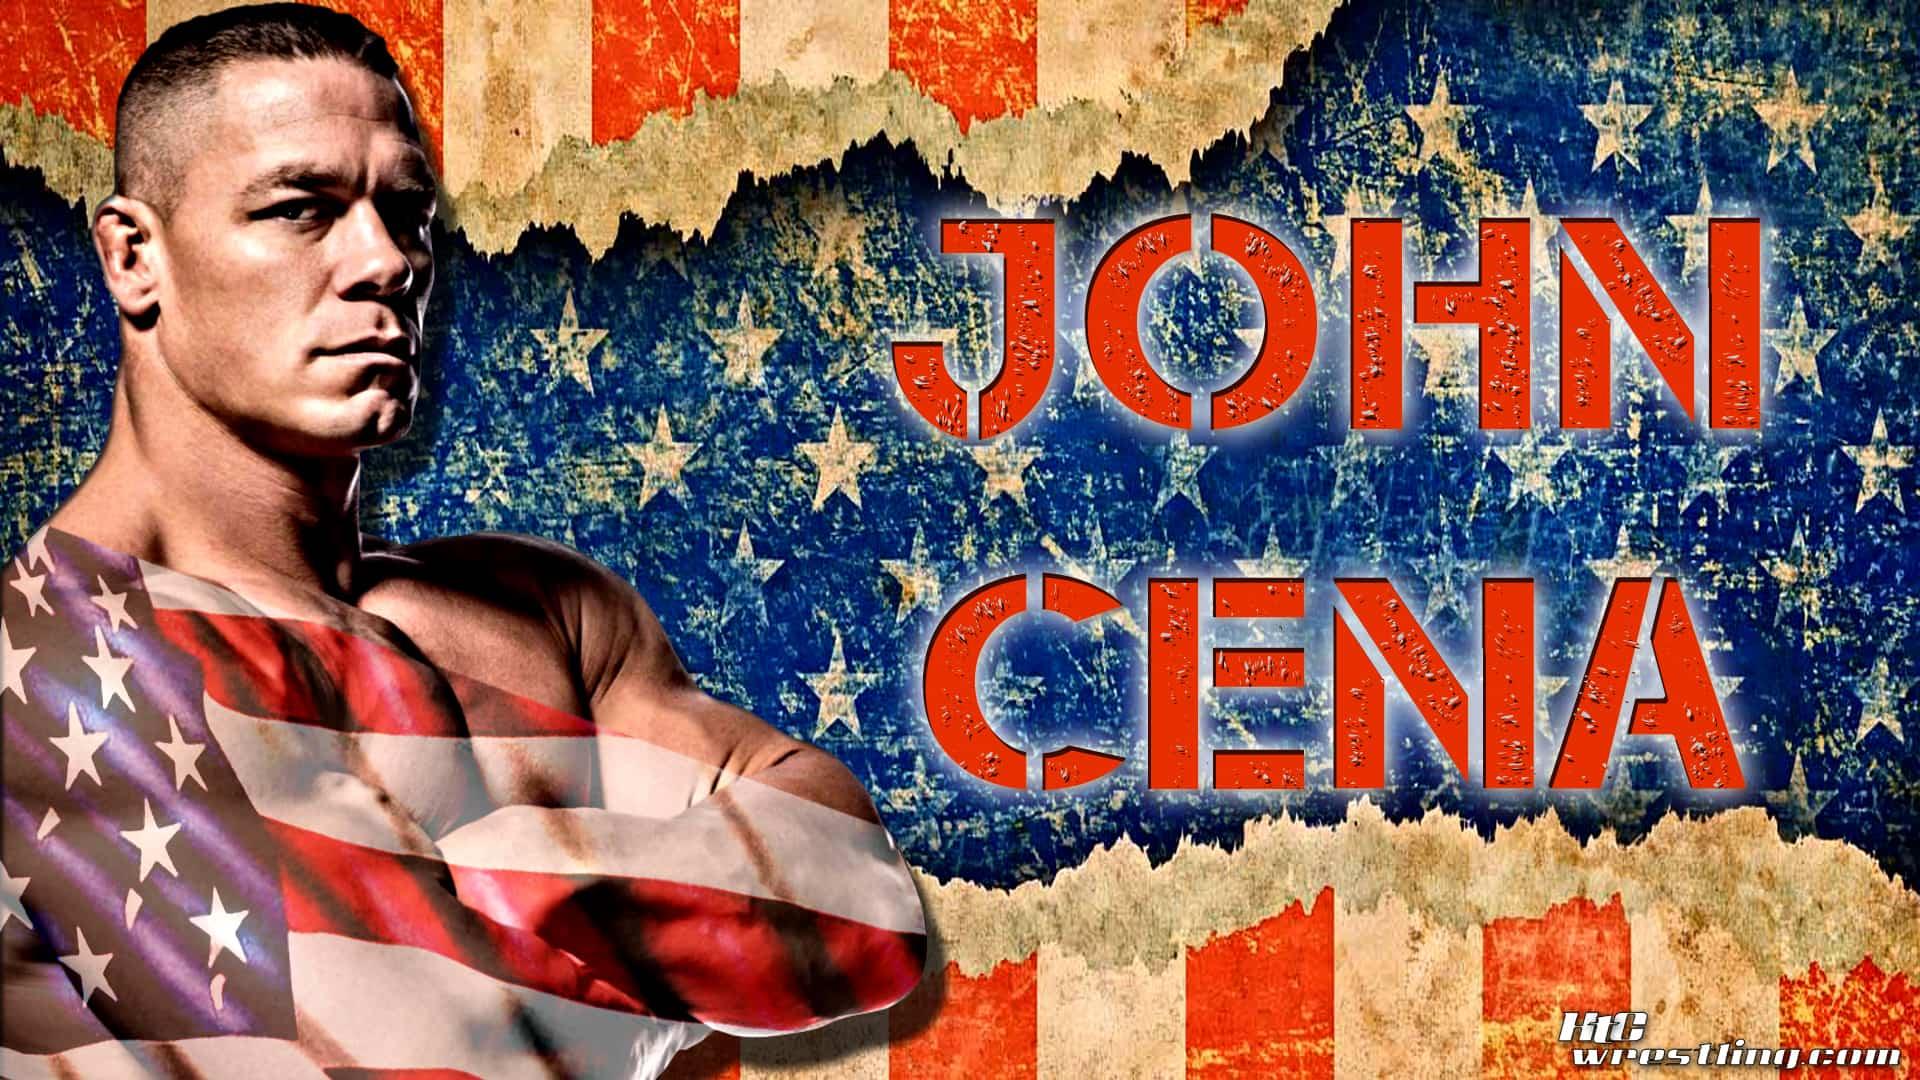 John Cena - Wallpaper by htcwrestling.com